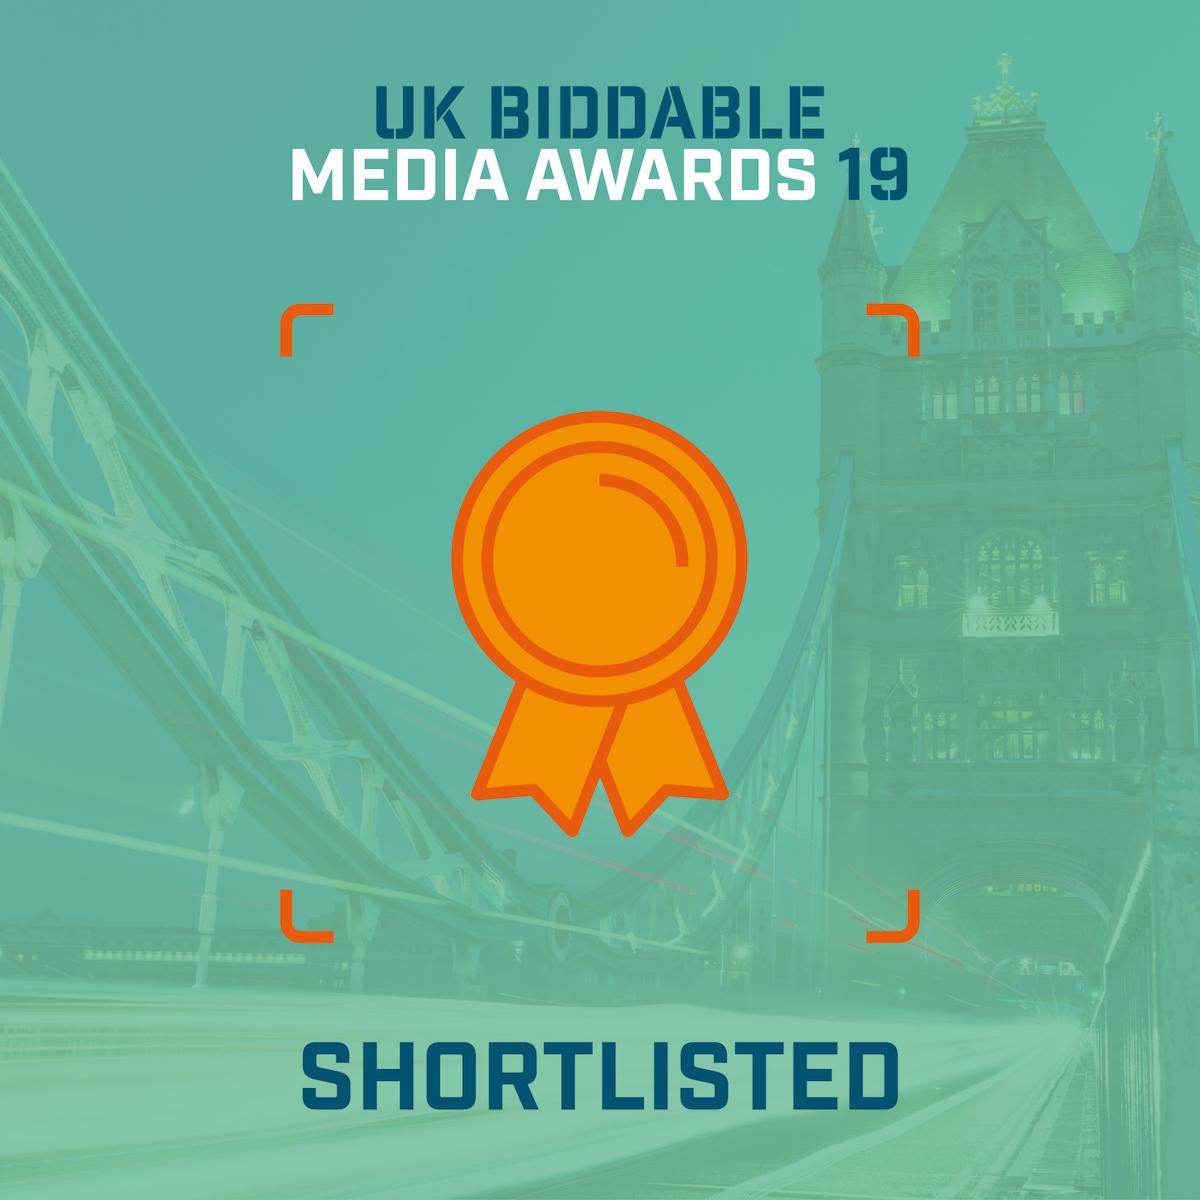 Biddable 2019 Shortlisted